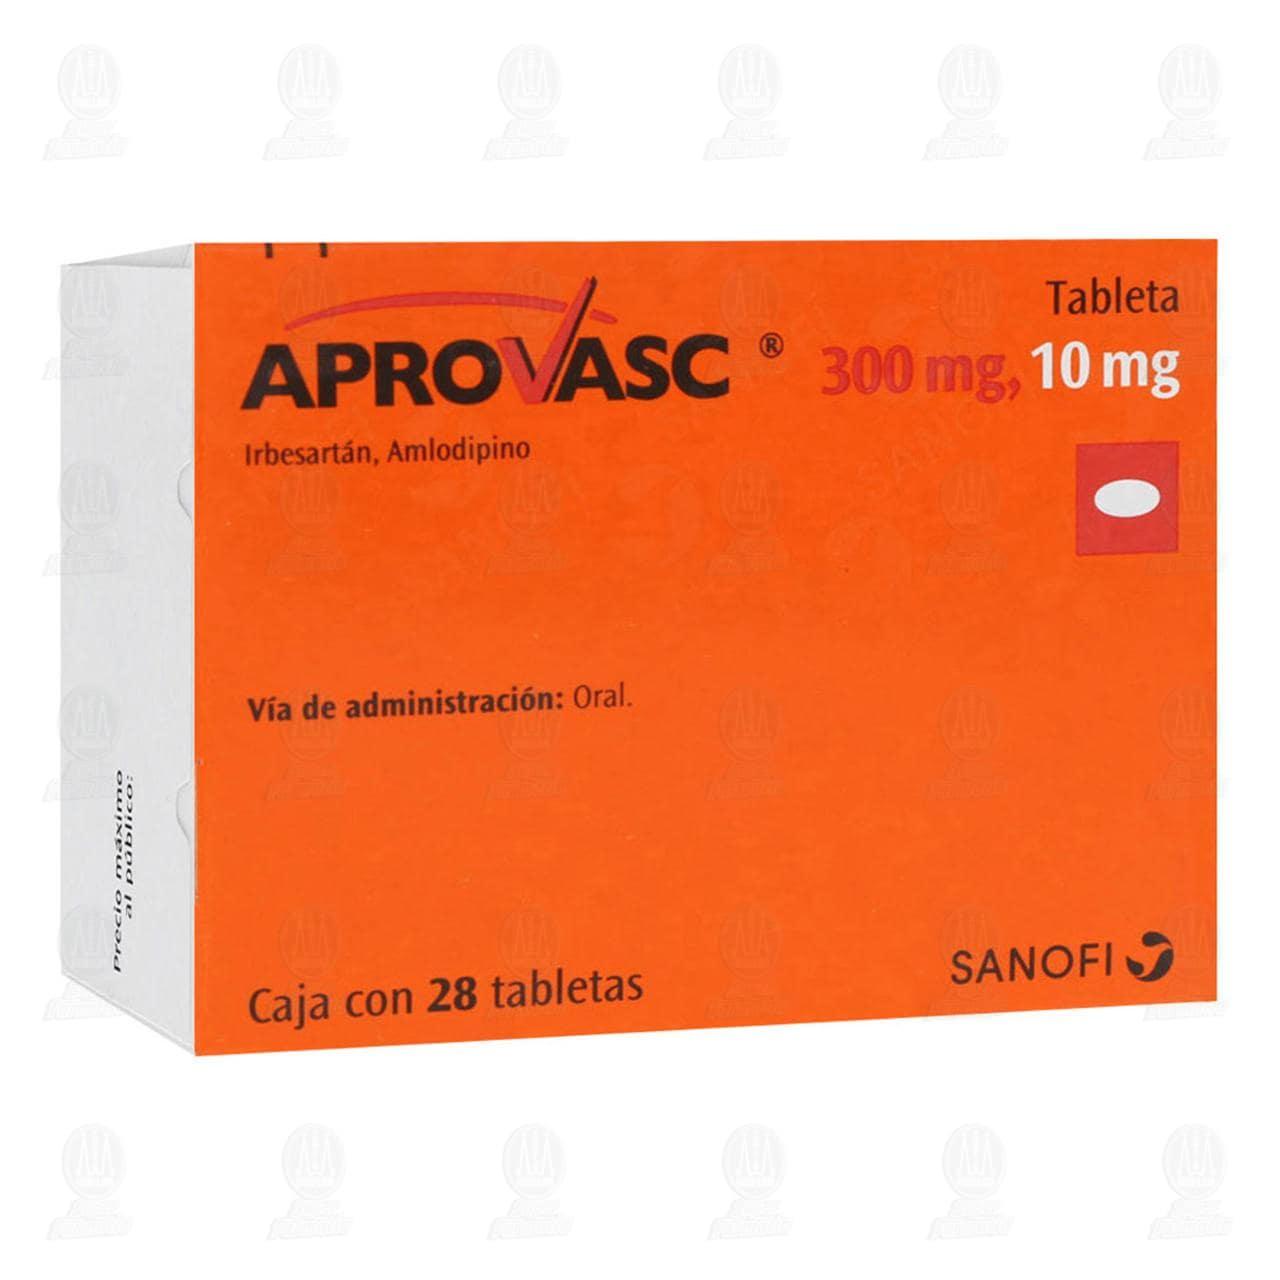 Comprar Aprovasc 300mg/10mg 28 Tabletas en Farmacias Guadalajara